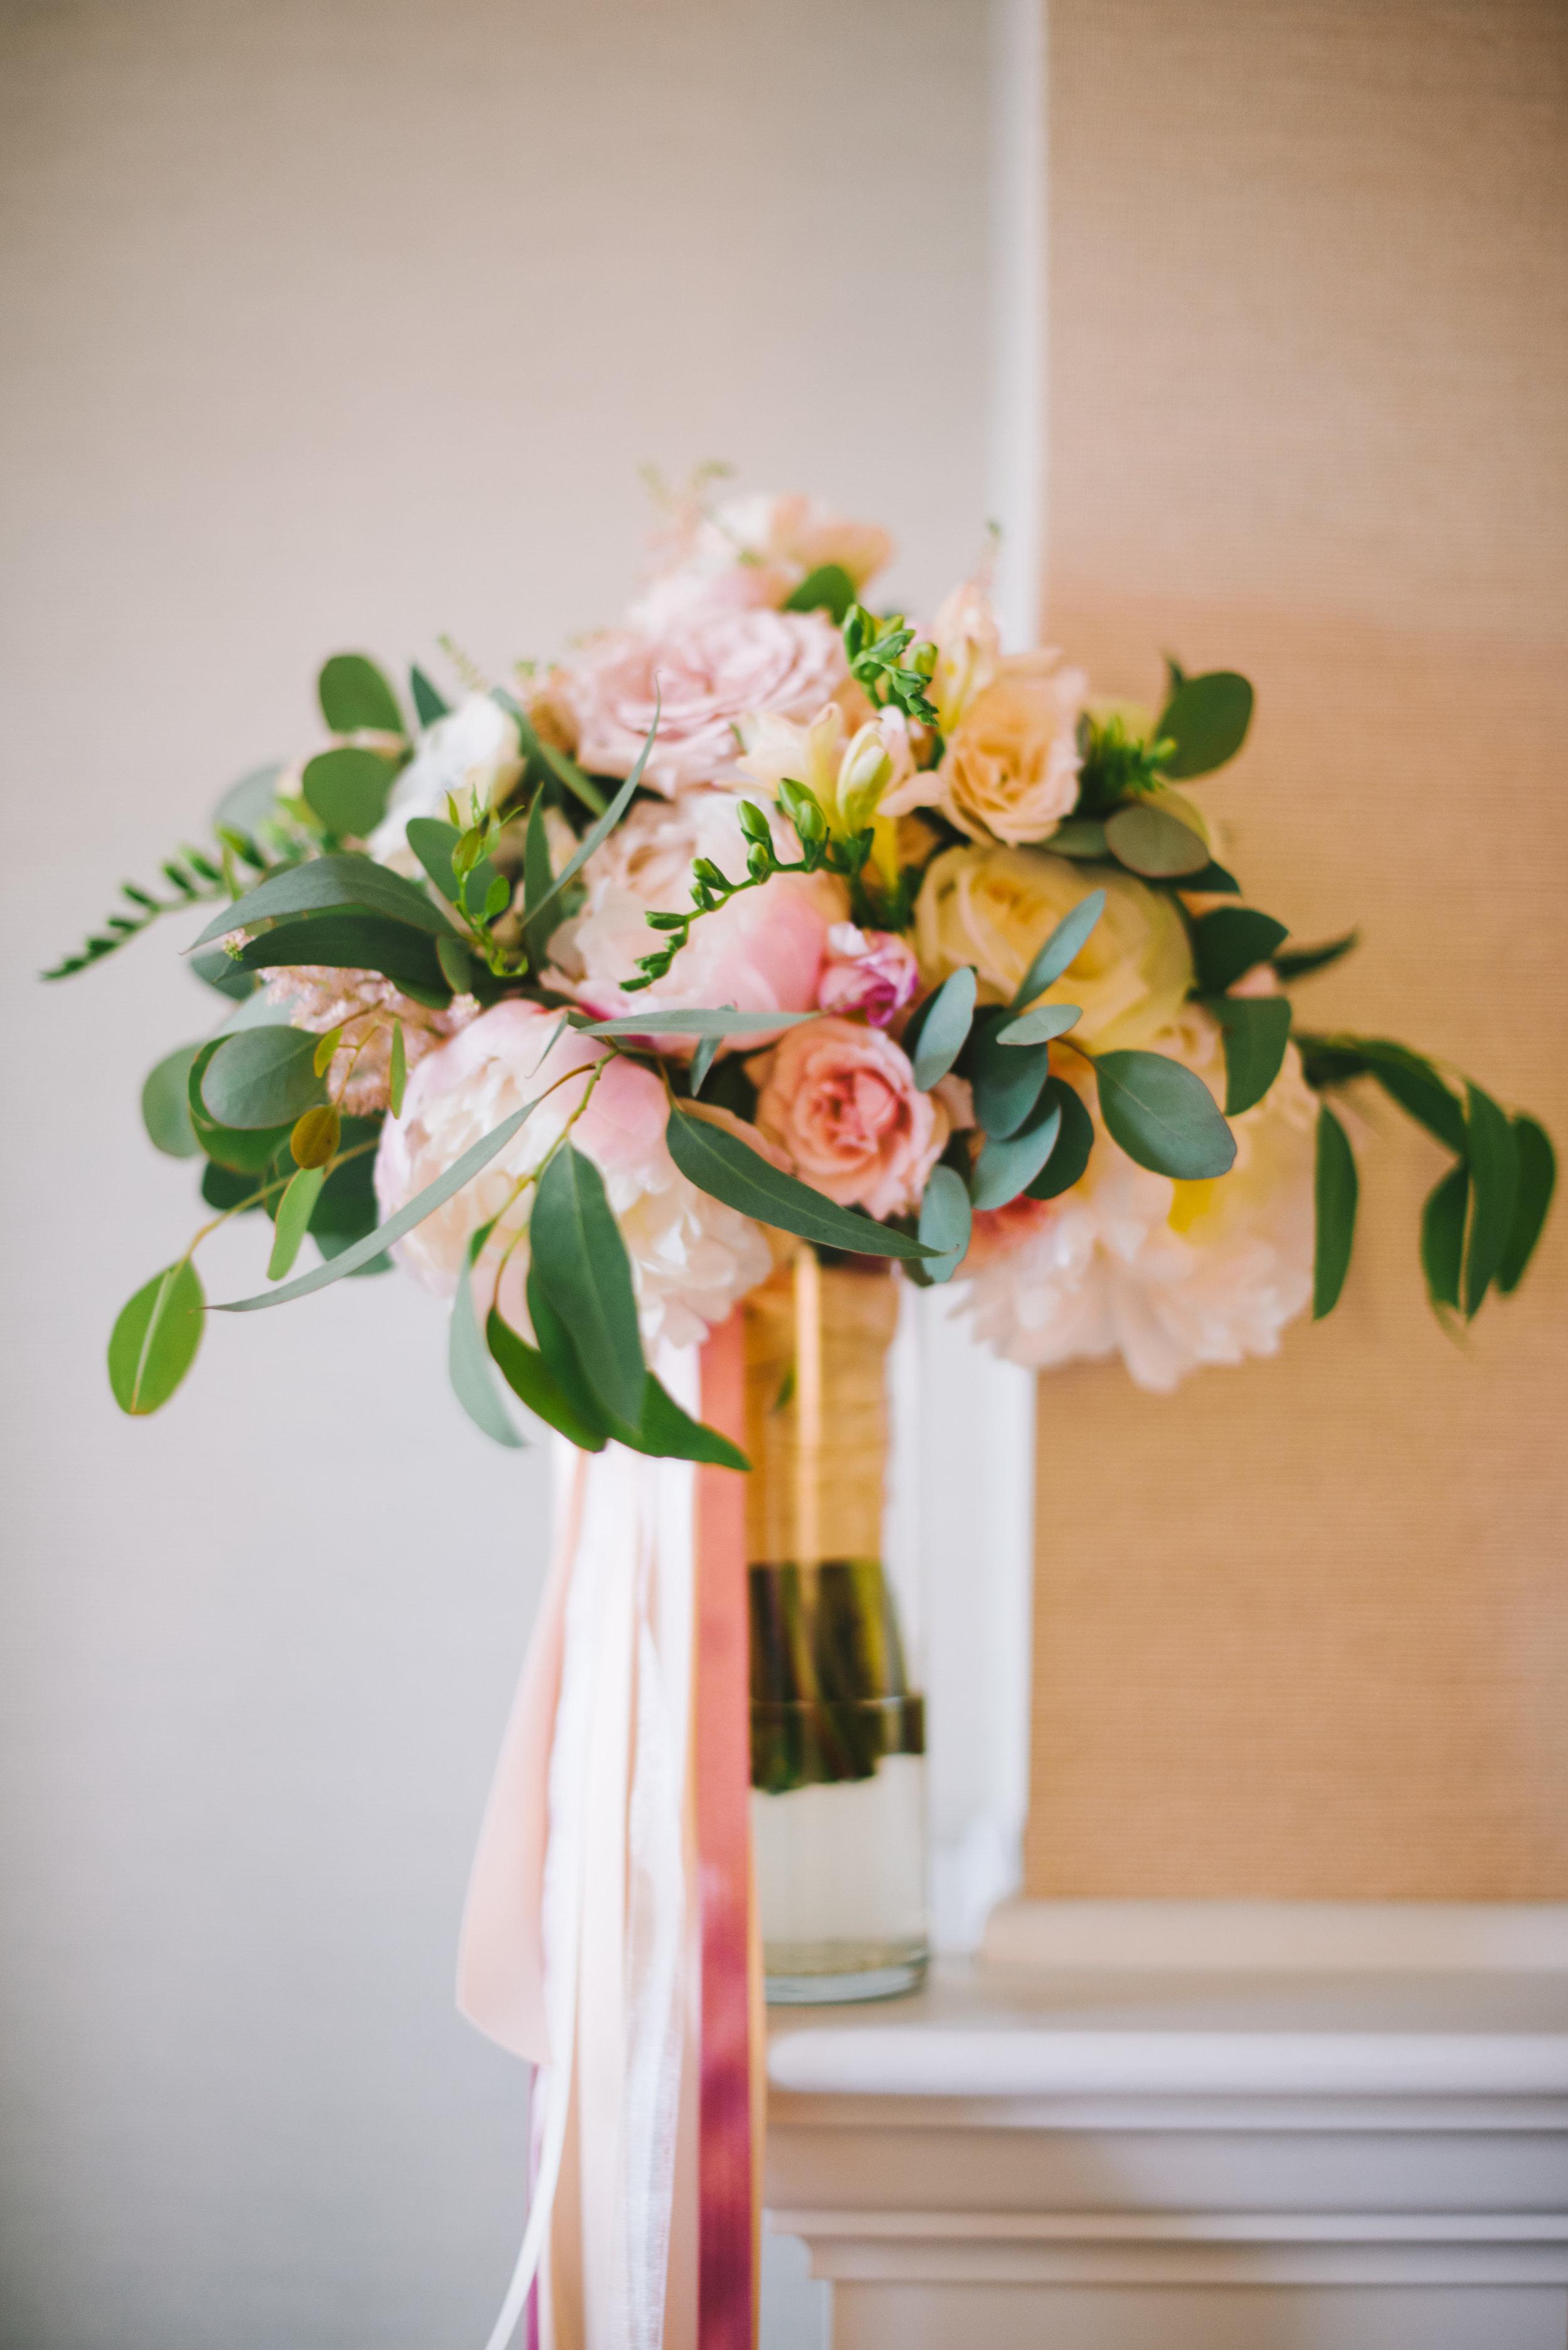 Wedding Day Timeline Tips